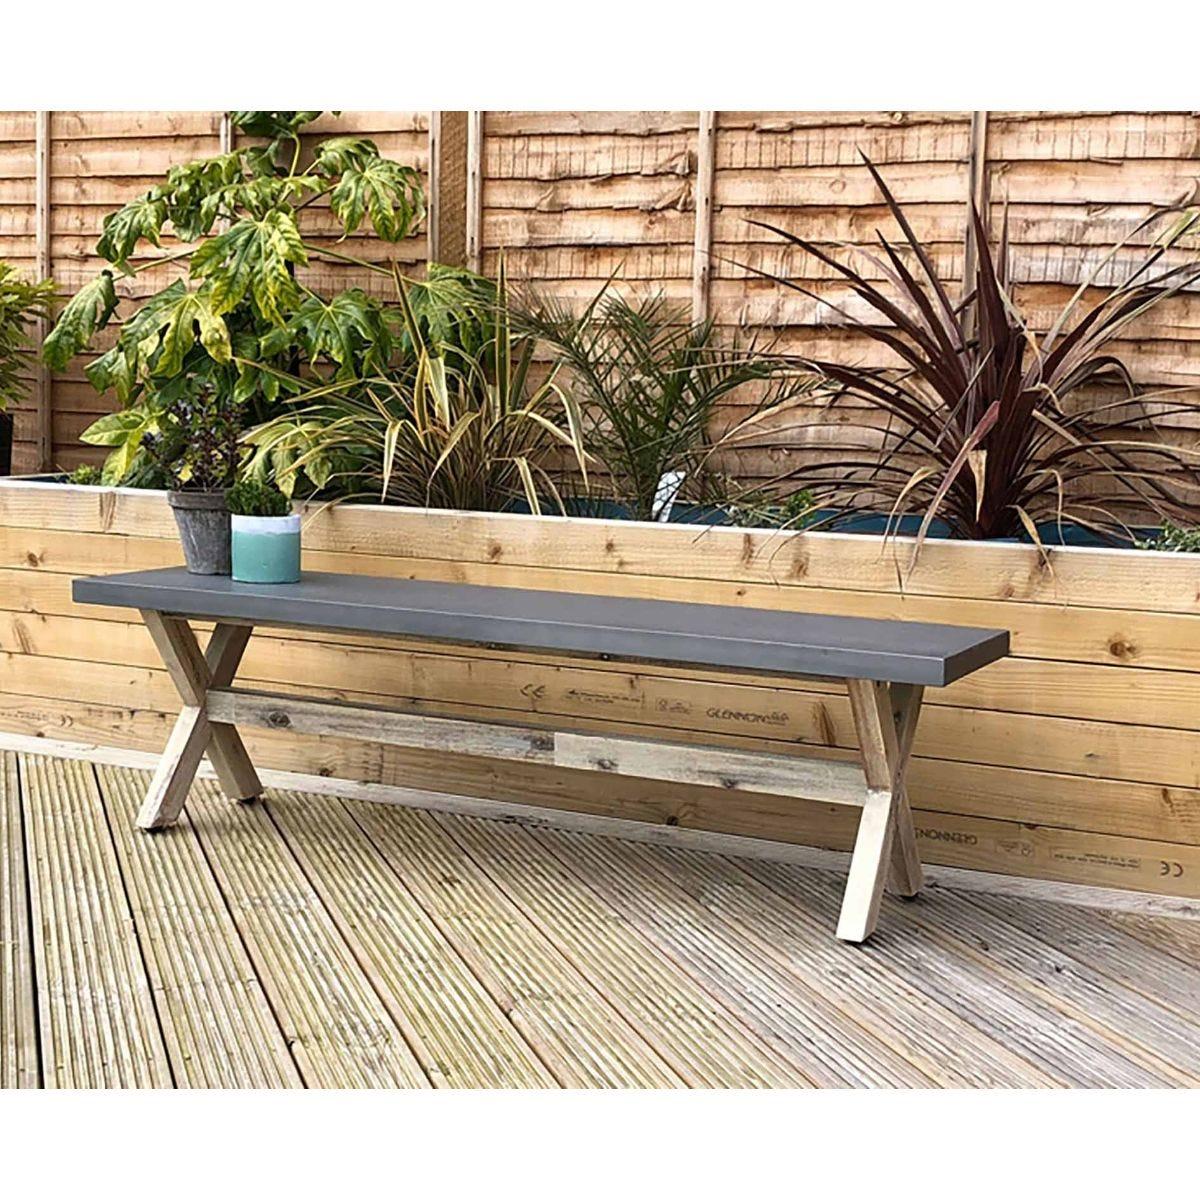 Charles Bentley Concrete Wood Garden Bench, Grey